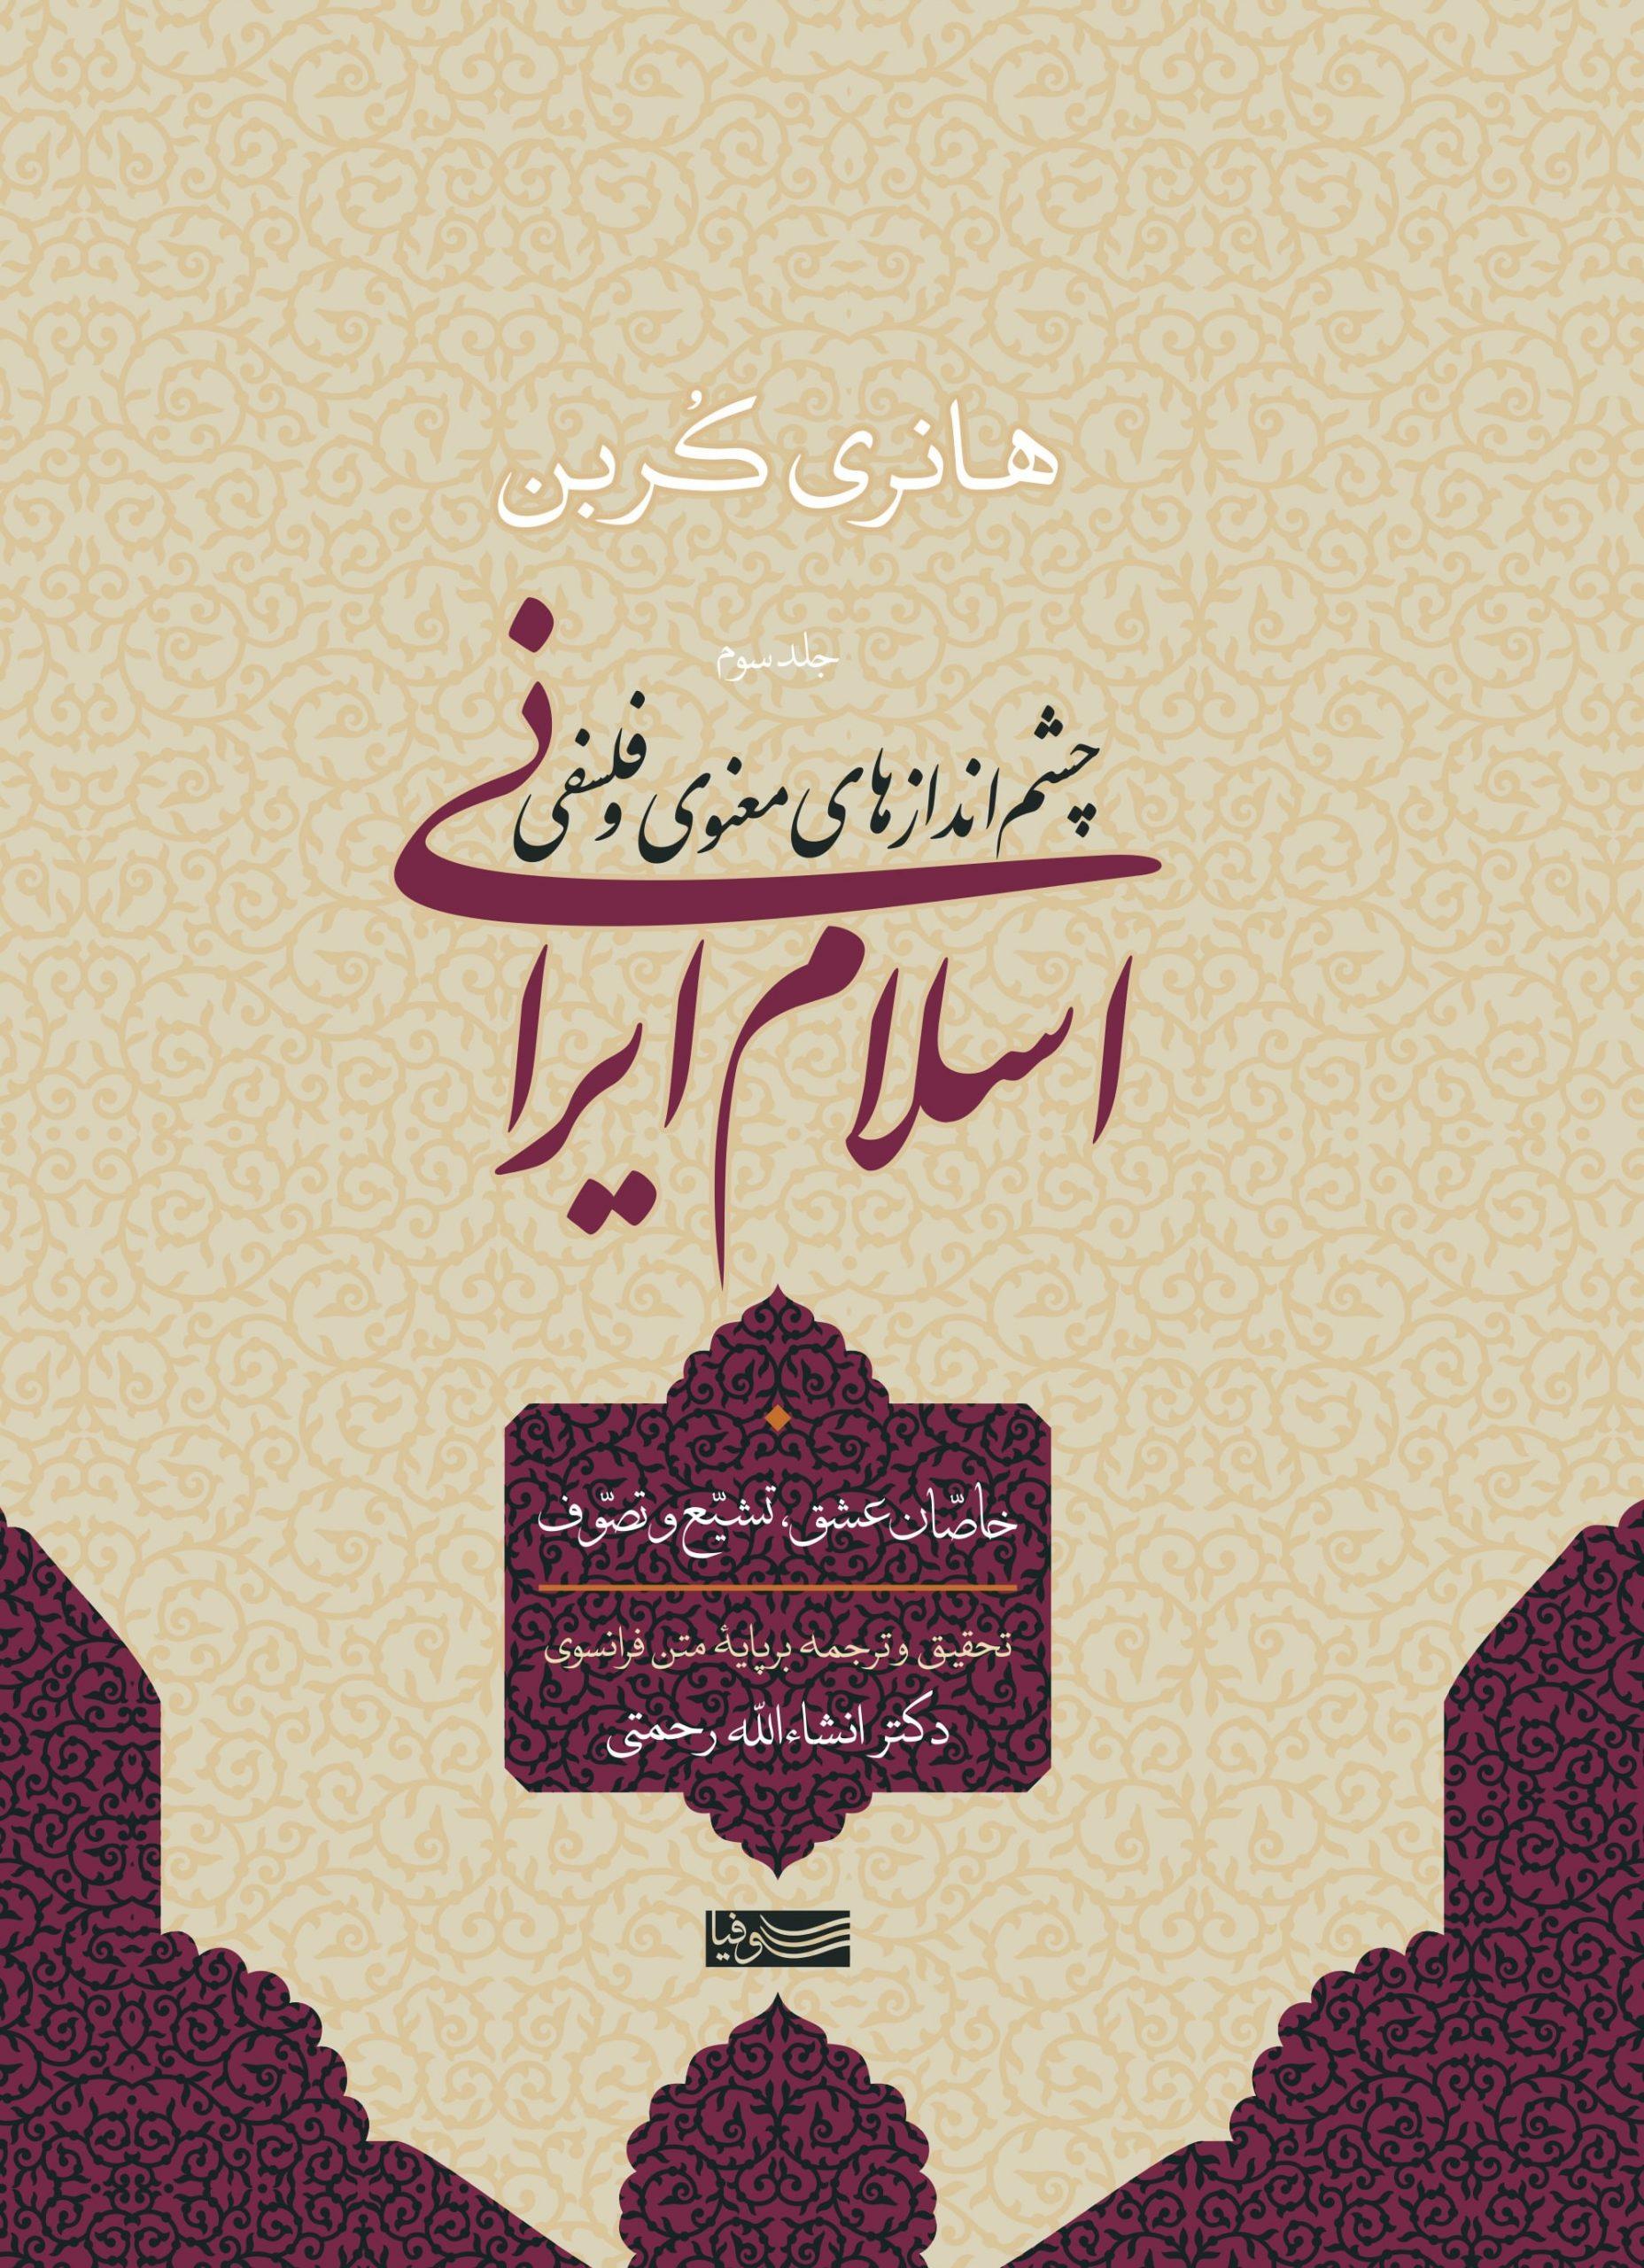 ESLAM-e-IRANI-v3-ORIG-94-11-5_1-min